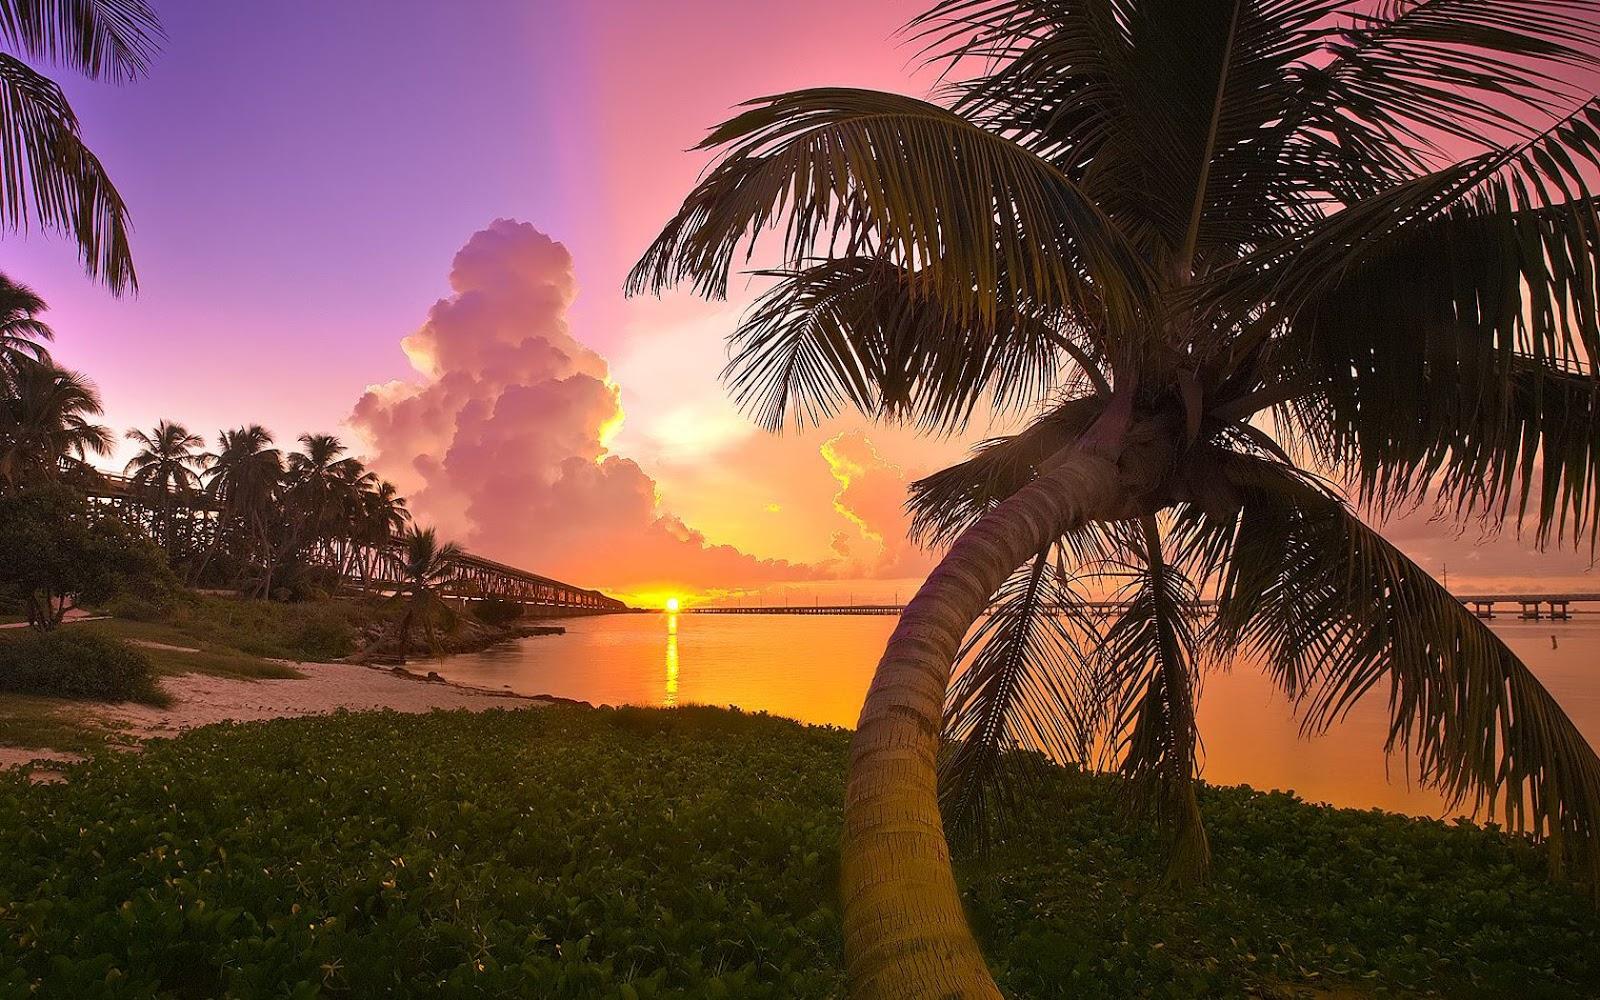 http://1.bp.blogspot.com/-A4F6Hck9O3c/T6RwvpUoSEI/AAAAAAAAdpg/qt5bIlWLrPE/s1600/Bahia+Honda+State+Park+Key+West+Florida.jpg